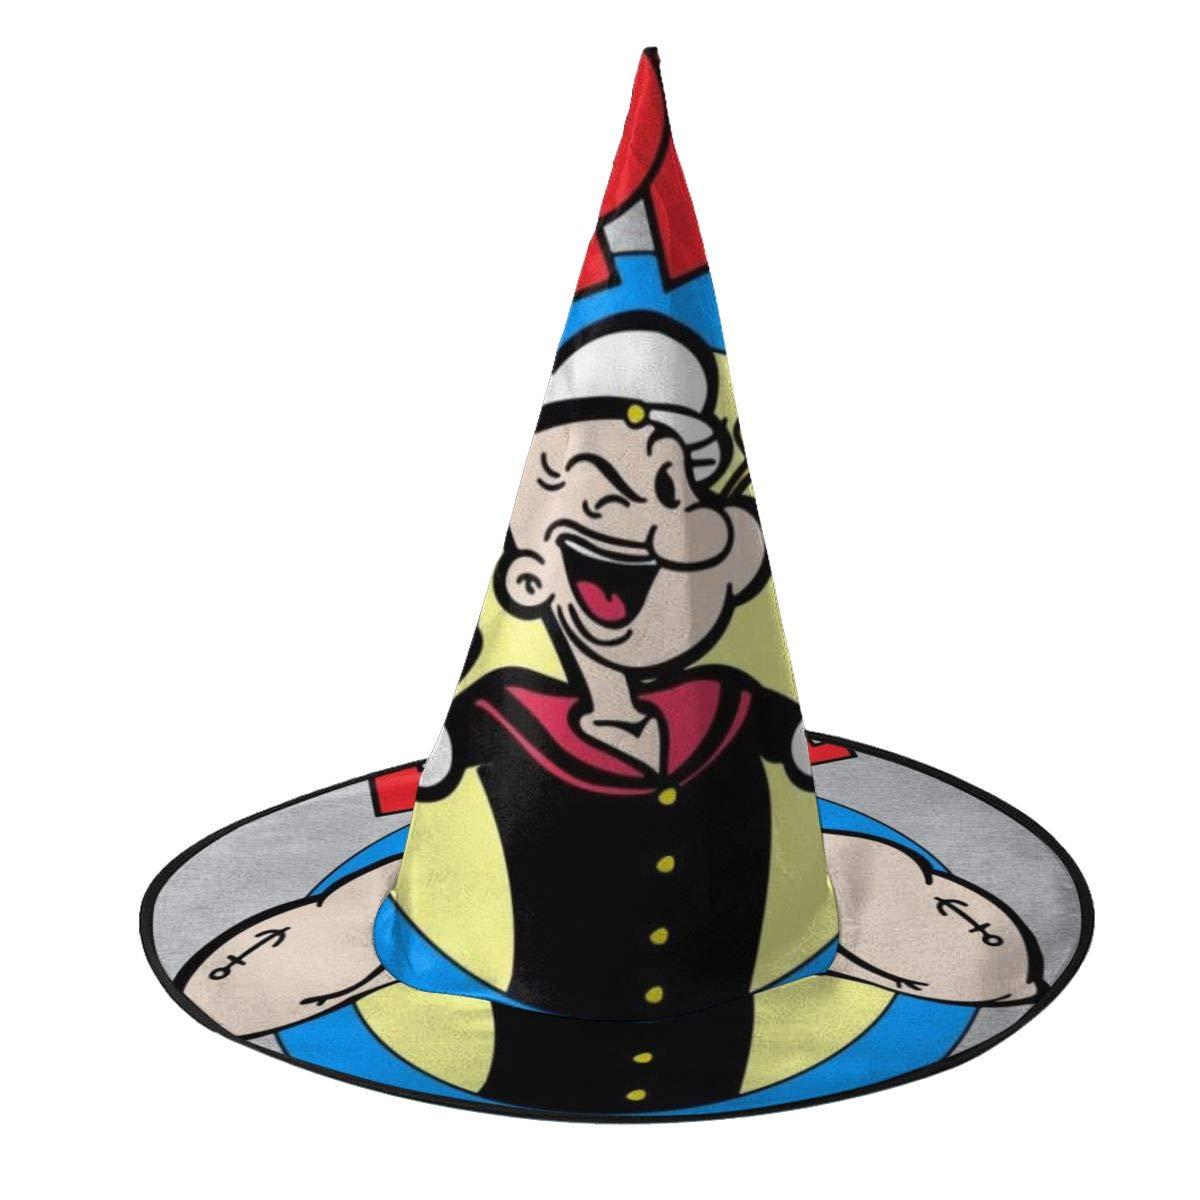 NUJSHF Popeye - Sombrero de Bruja Unisex para Fiestas de Halloween ...